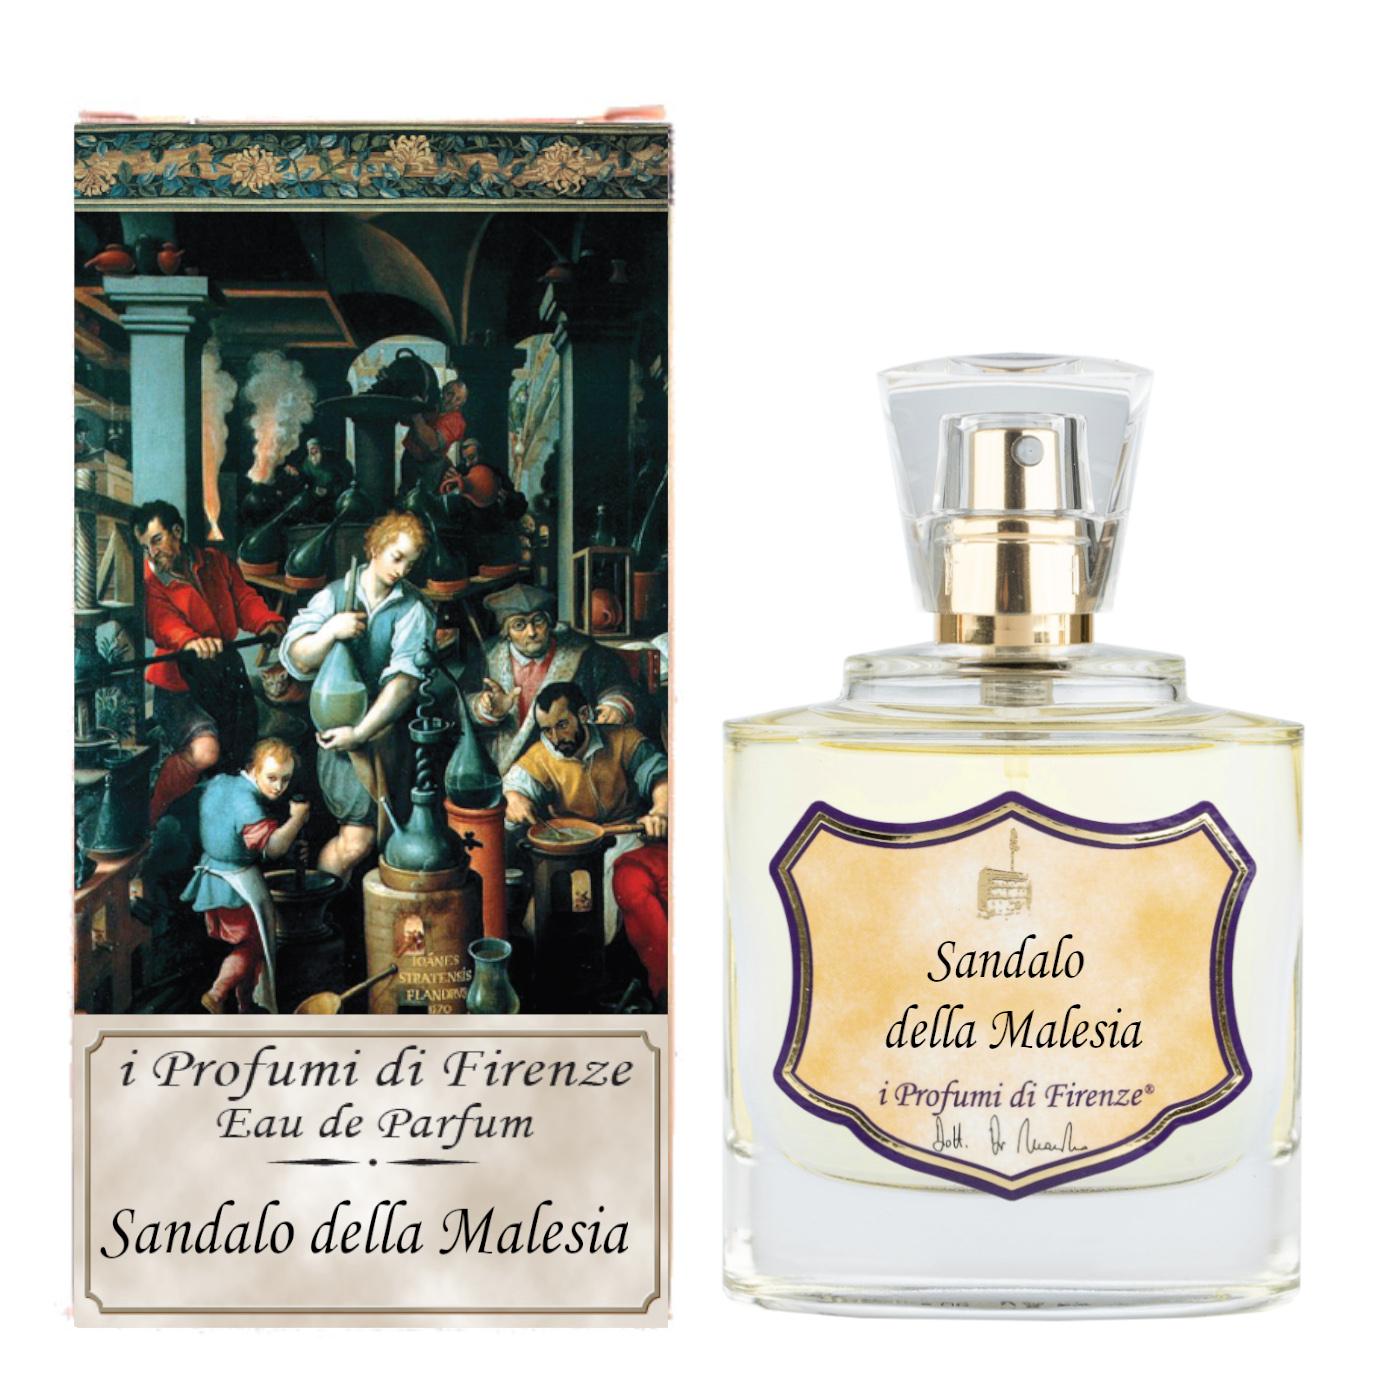 SANDALO DELLA MALESIA - Eau de Parfum-4100